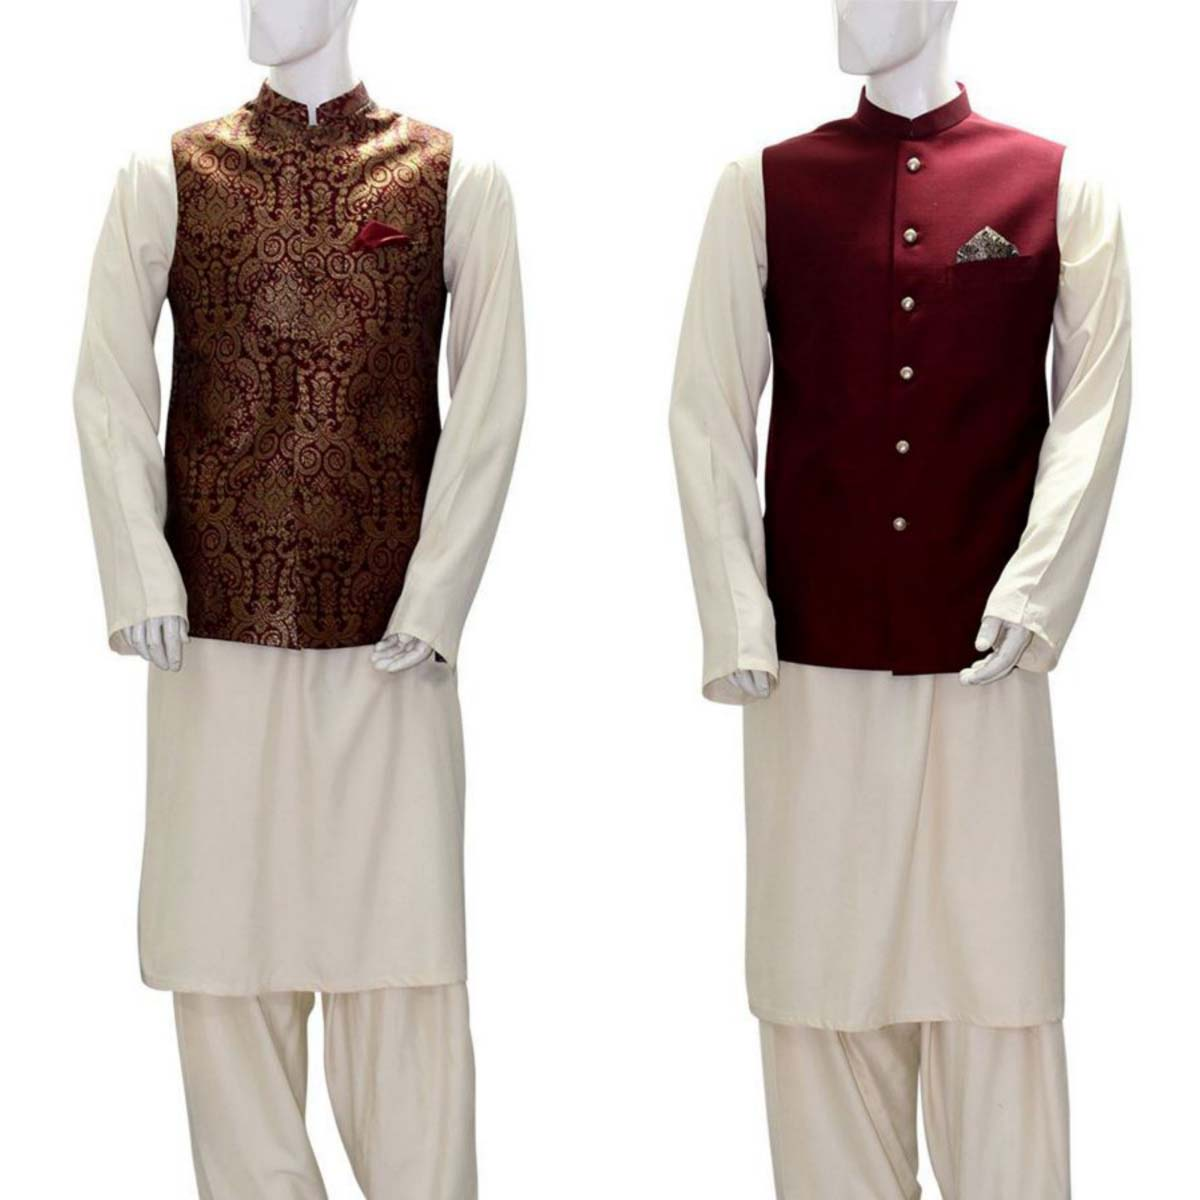 deepak perwani formal collection